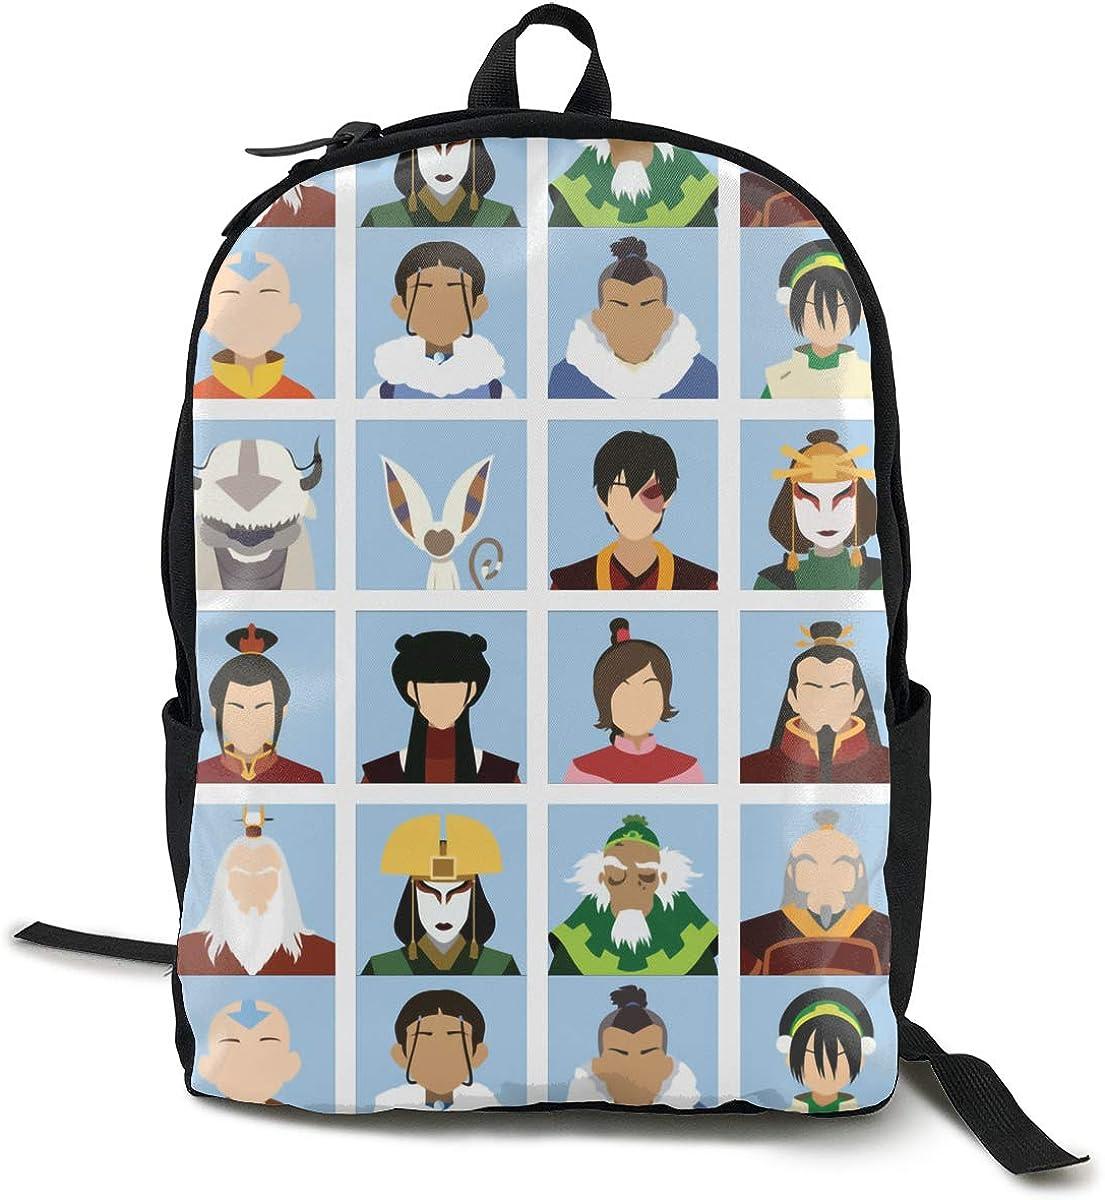 Classic Worlde Backpack Bag Avatar Last Air-ben-der Large Capacity Novelty Laptop Bag For Kids Women Men